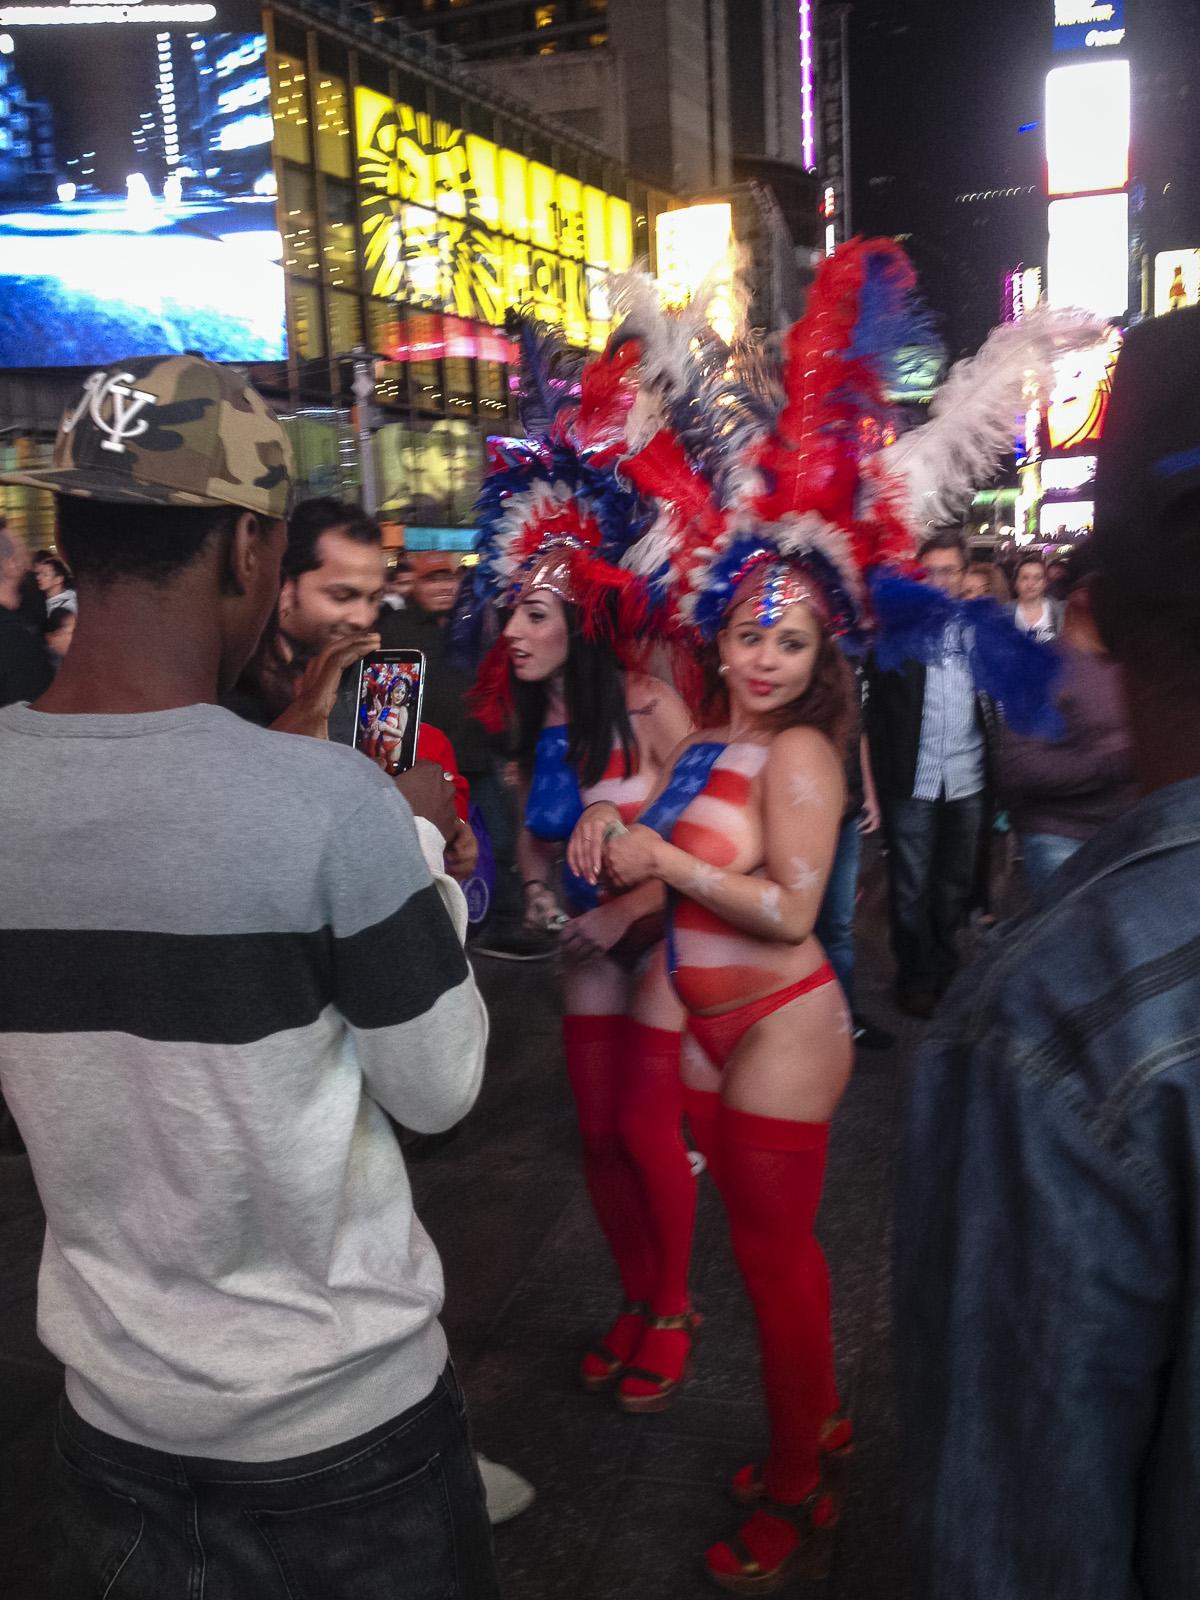 NYC2014-iphone-001.jpg